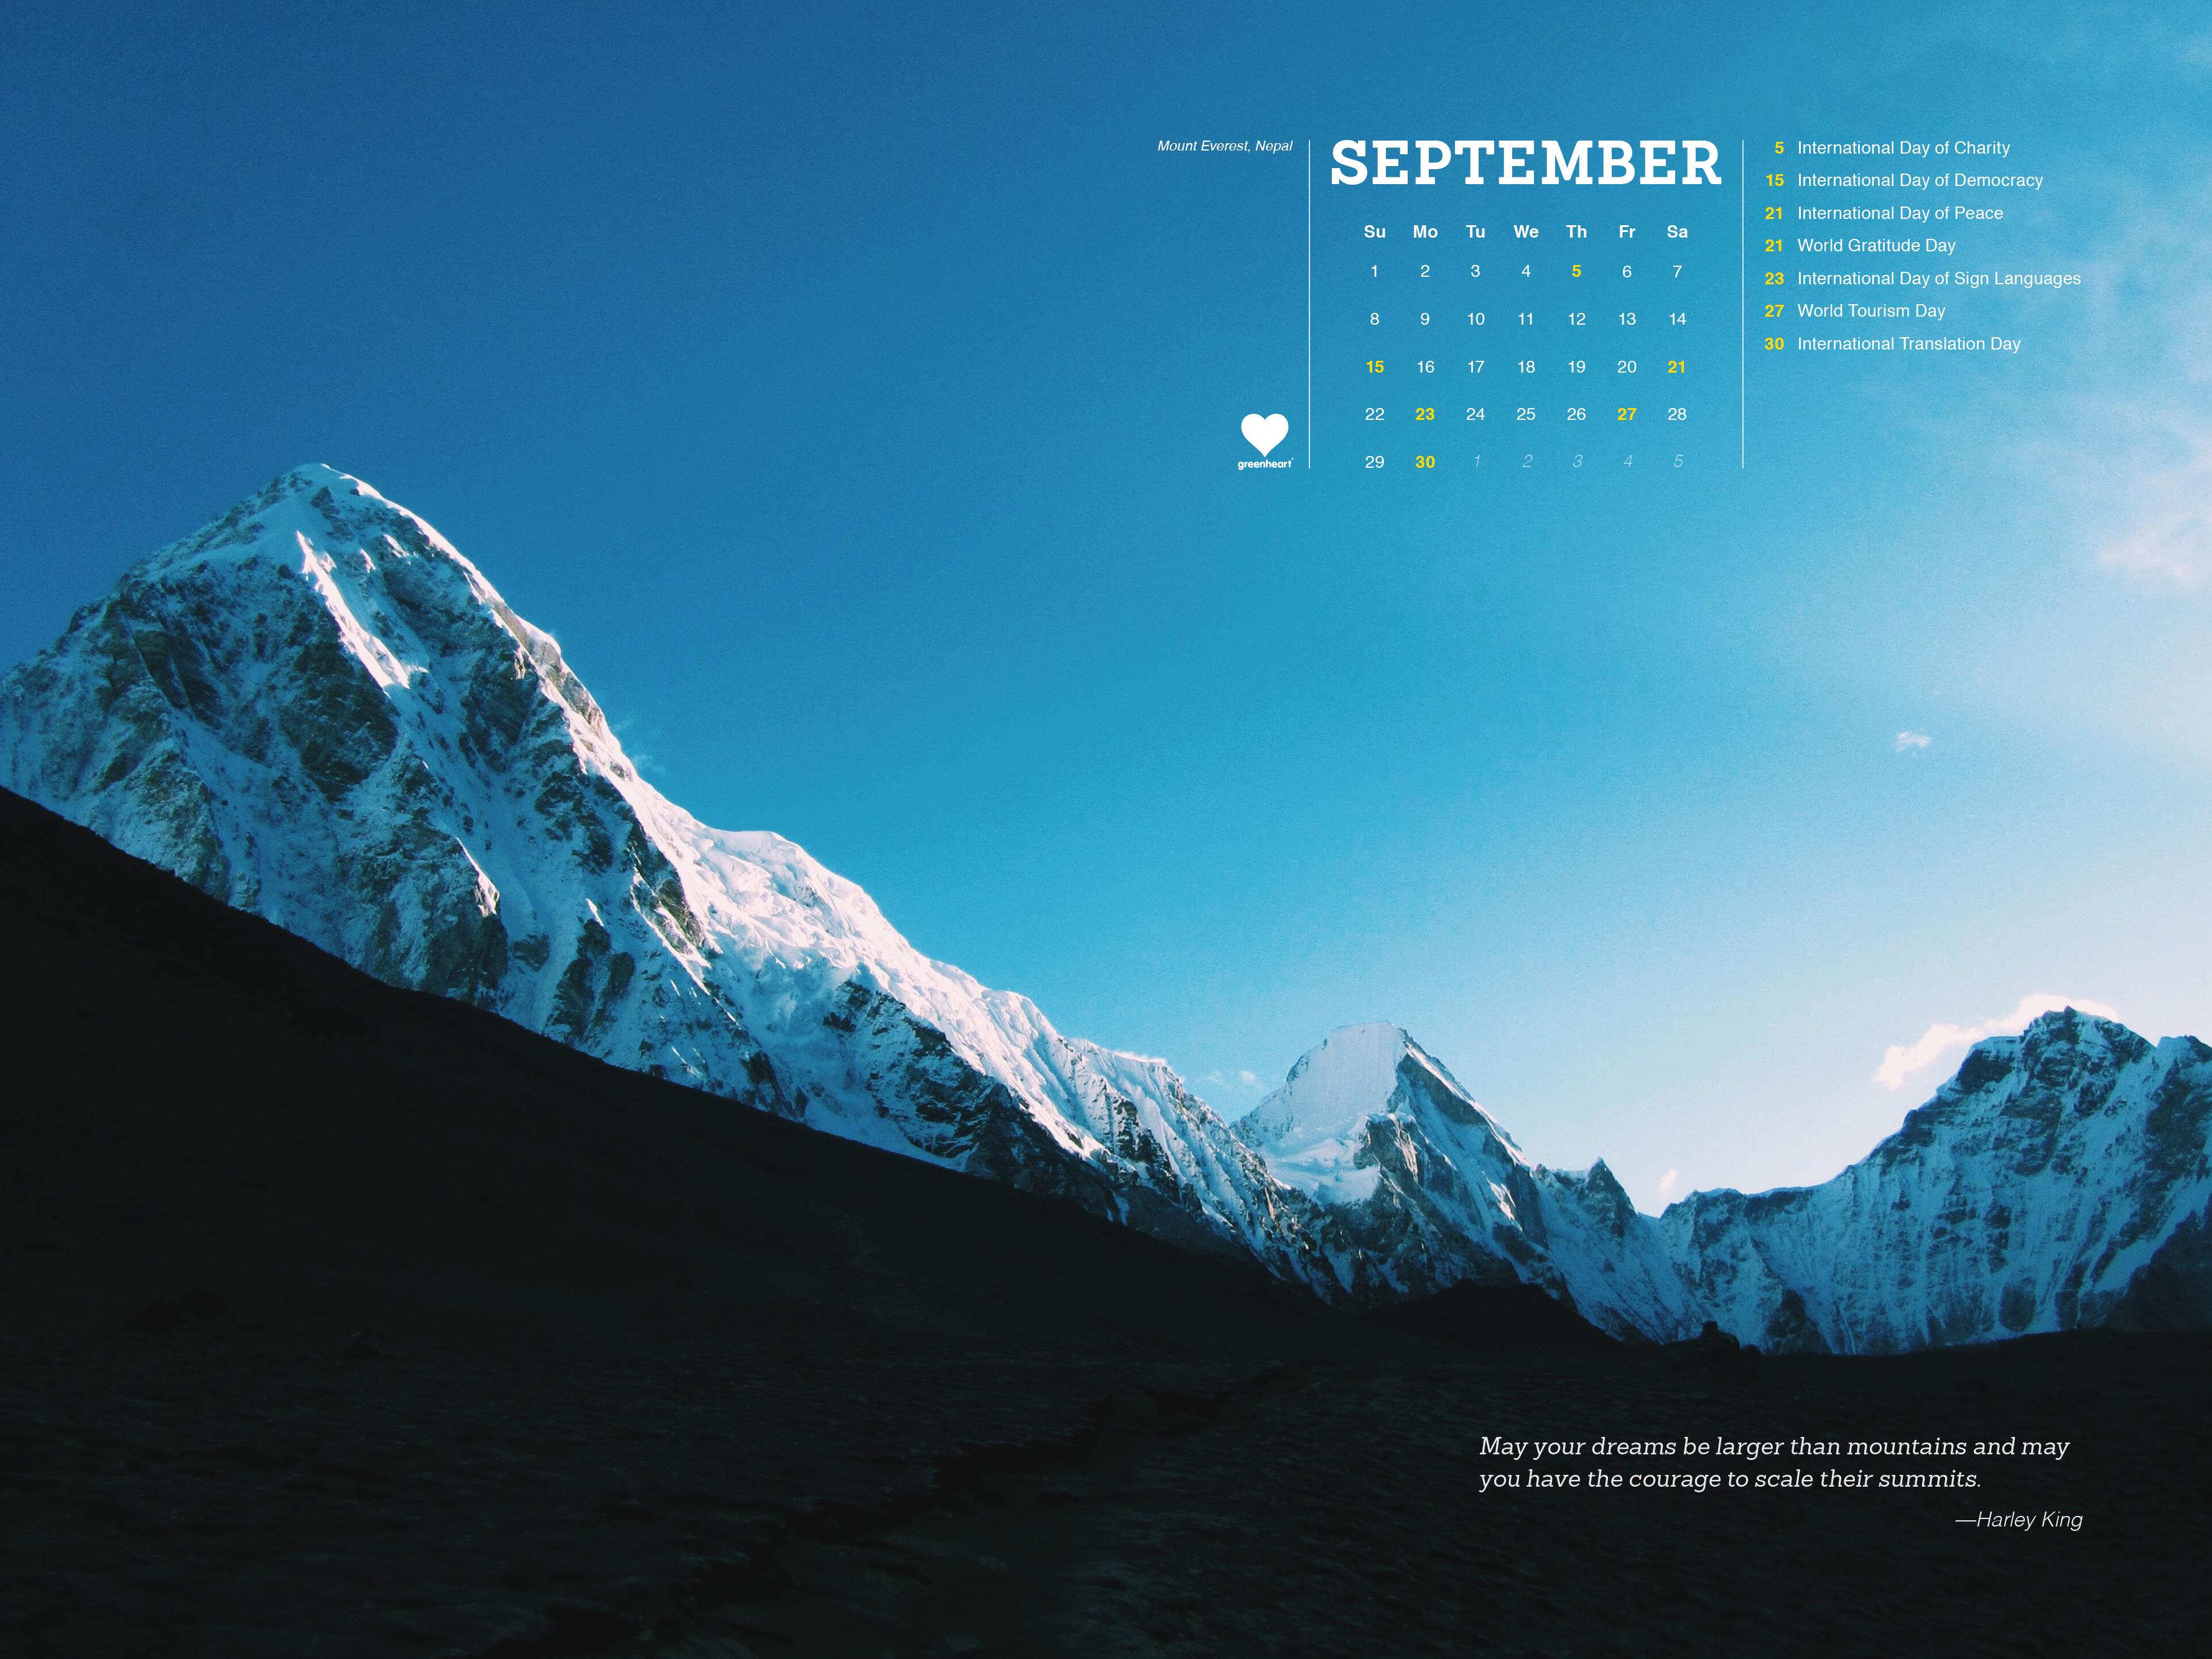 Falling into September – the Greenheart Global Calendar